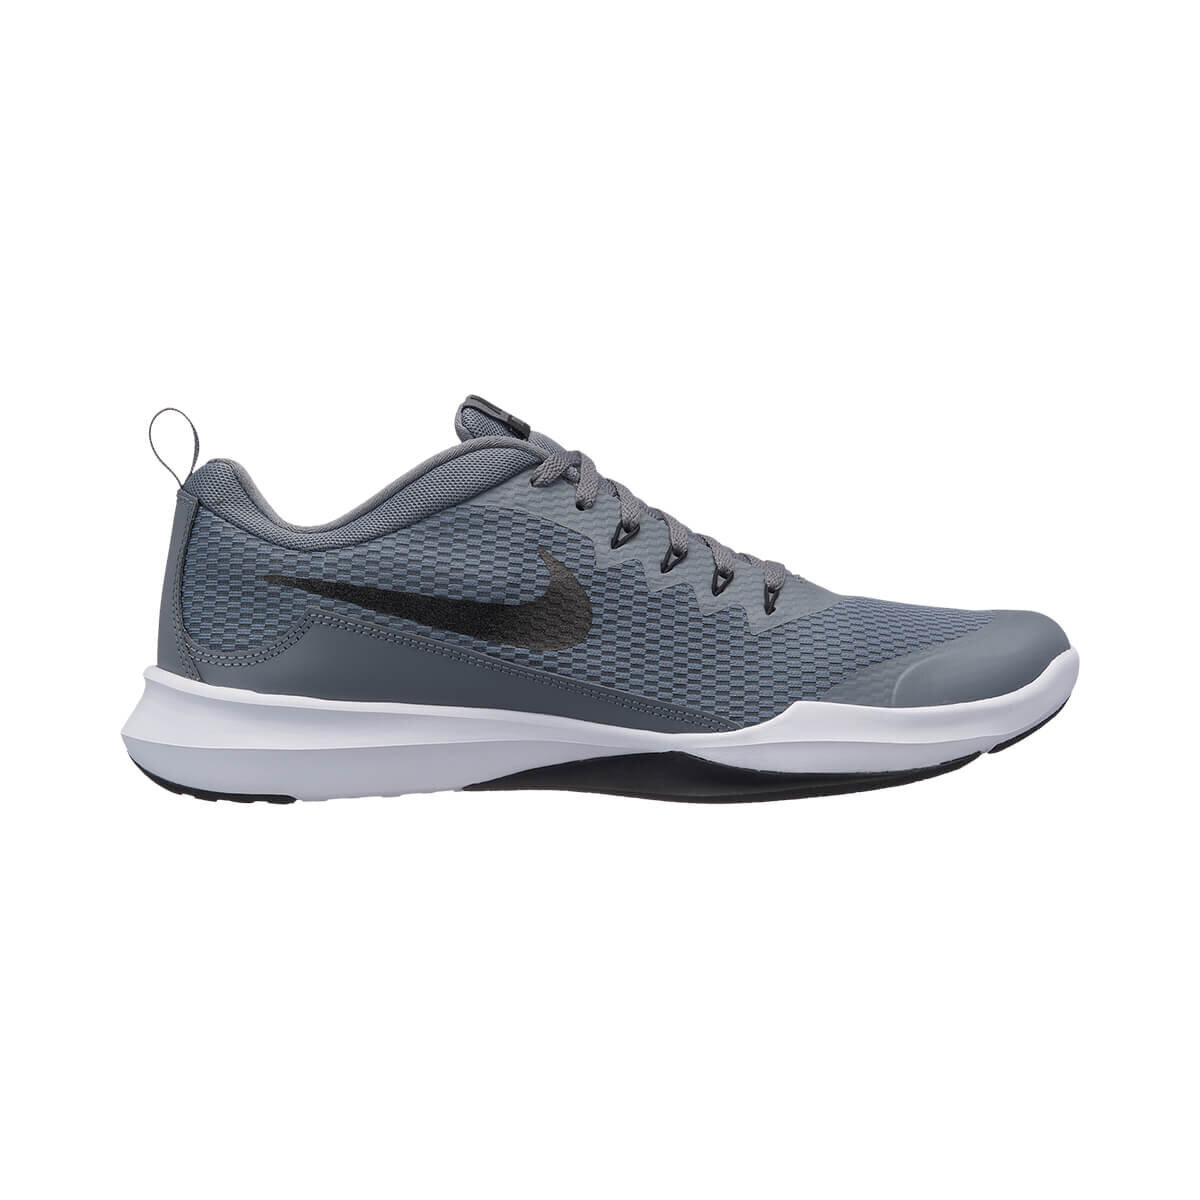 GRI Erkek Fitness Ayakkabısı LEGEND TRAINER